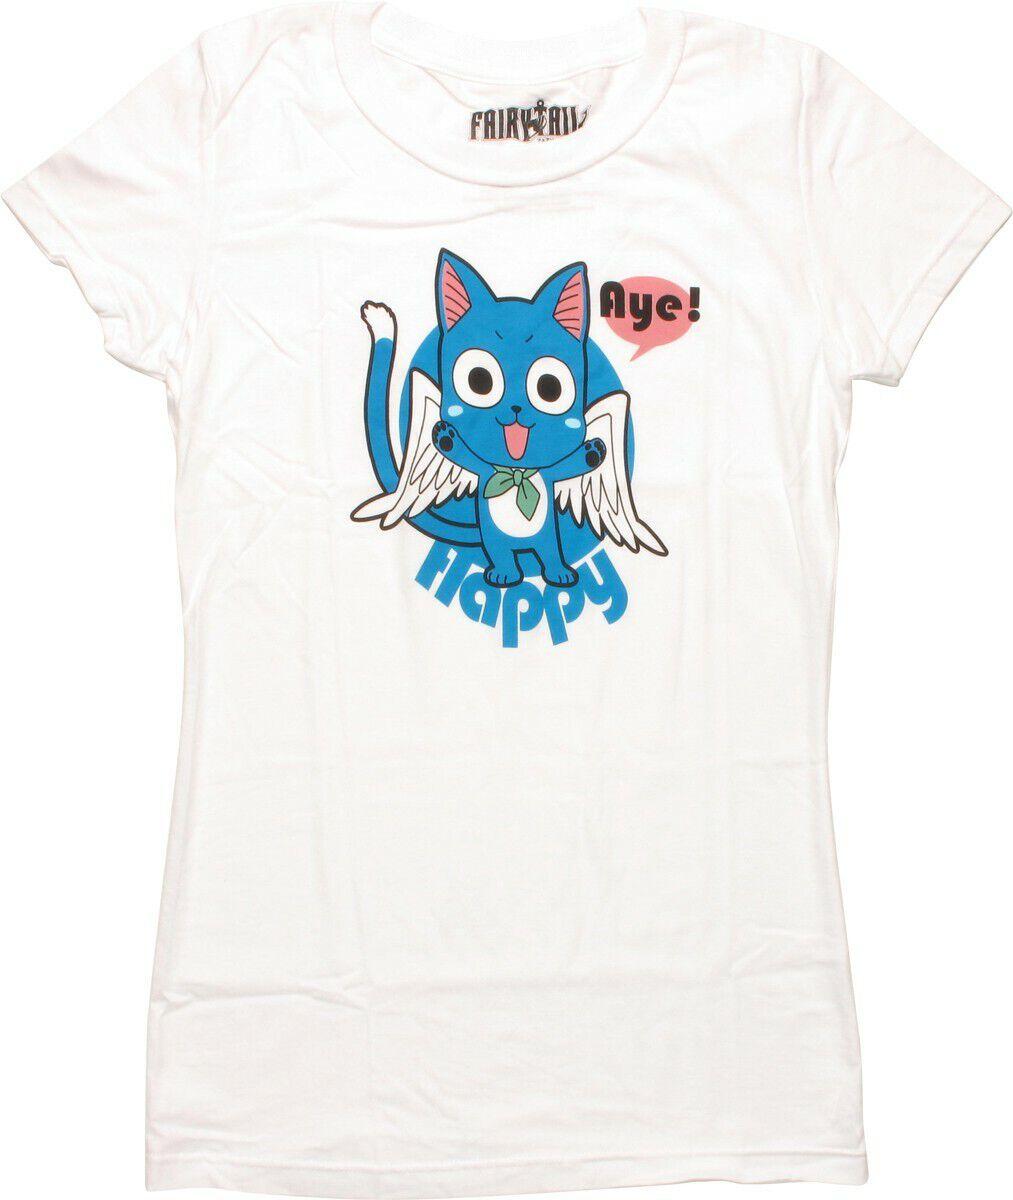 Fairy Tail Angelic Wings Happy Aye Juniors T-Shirt